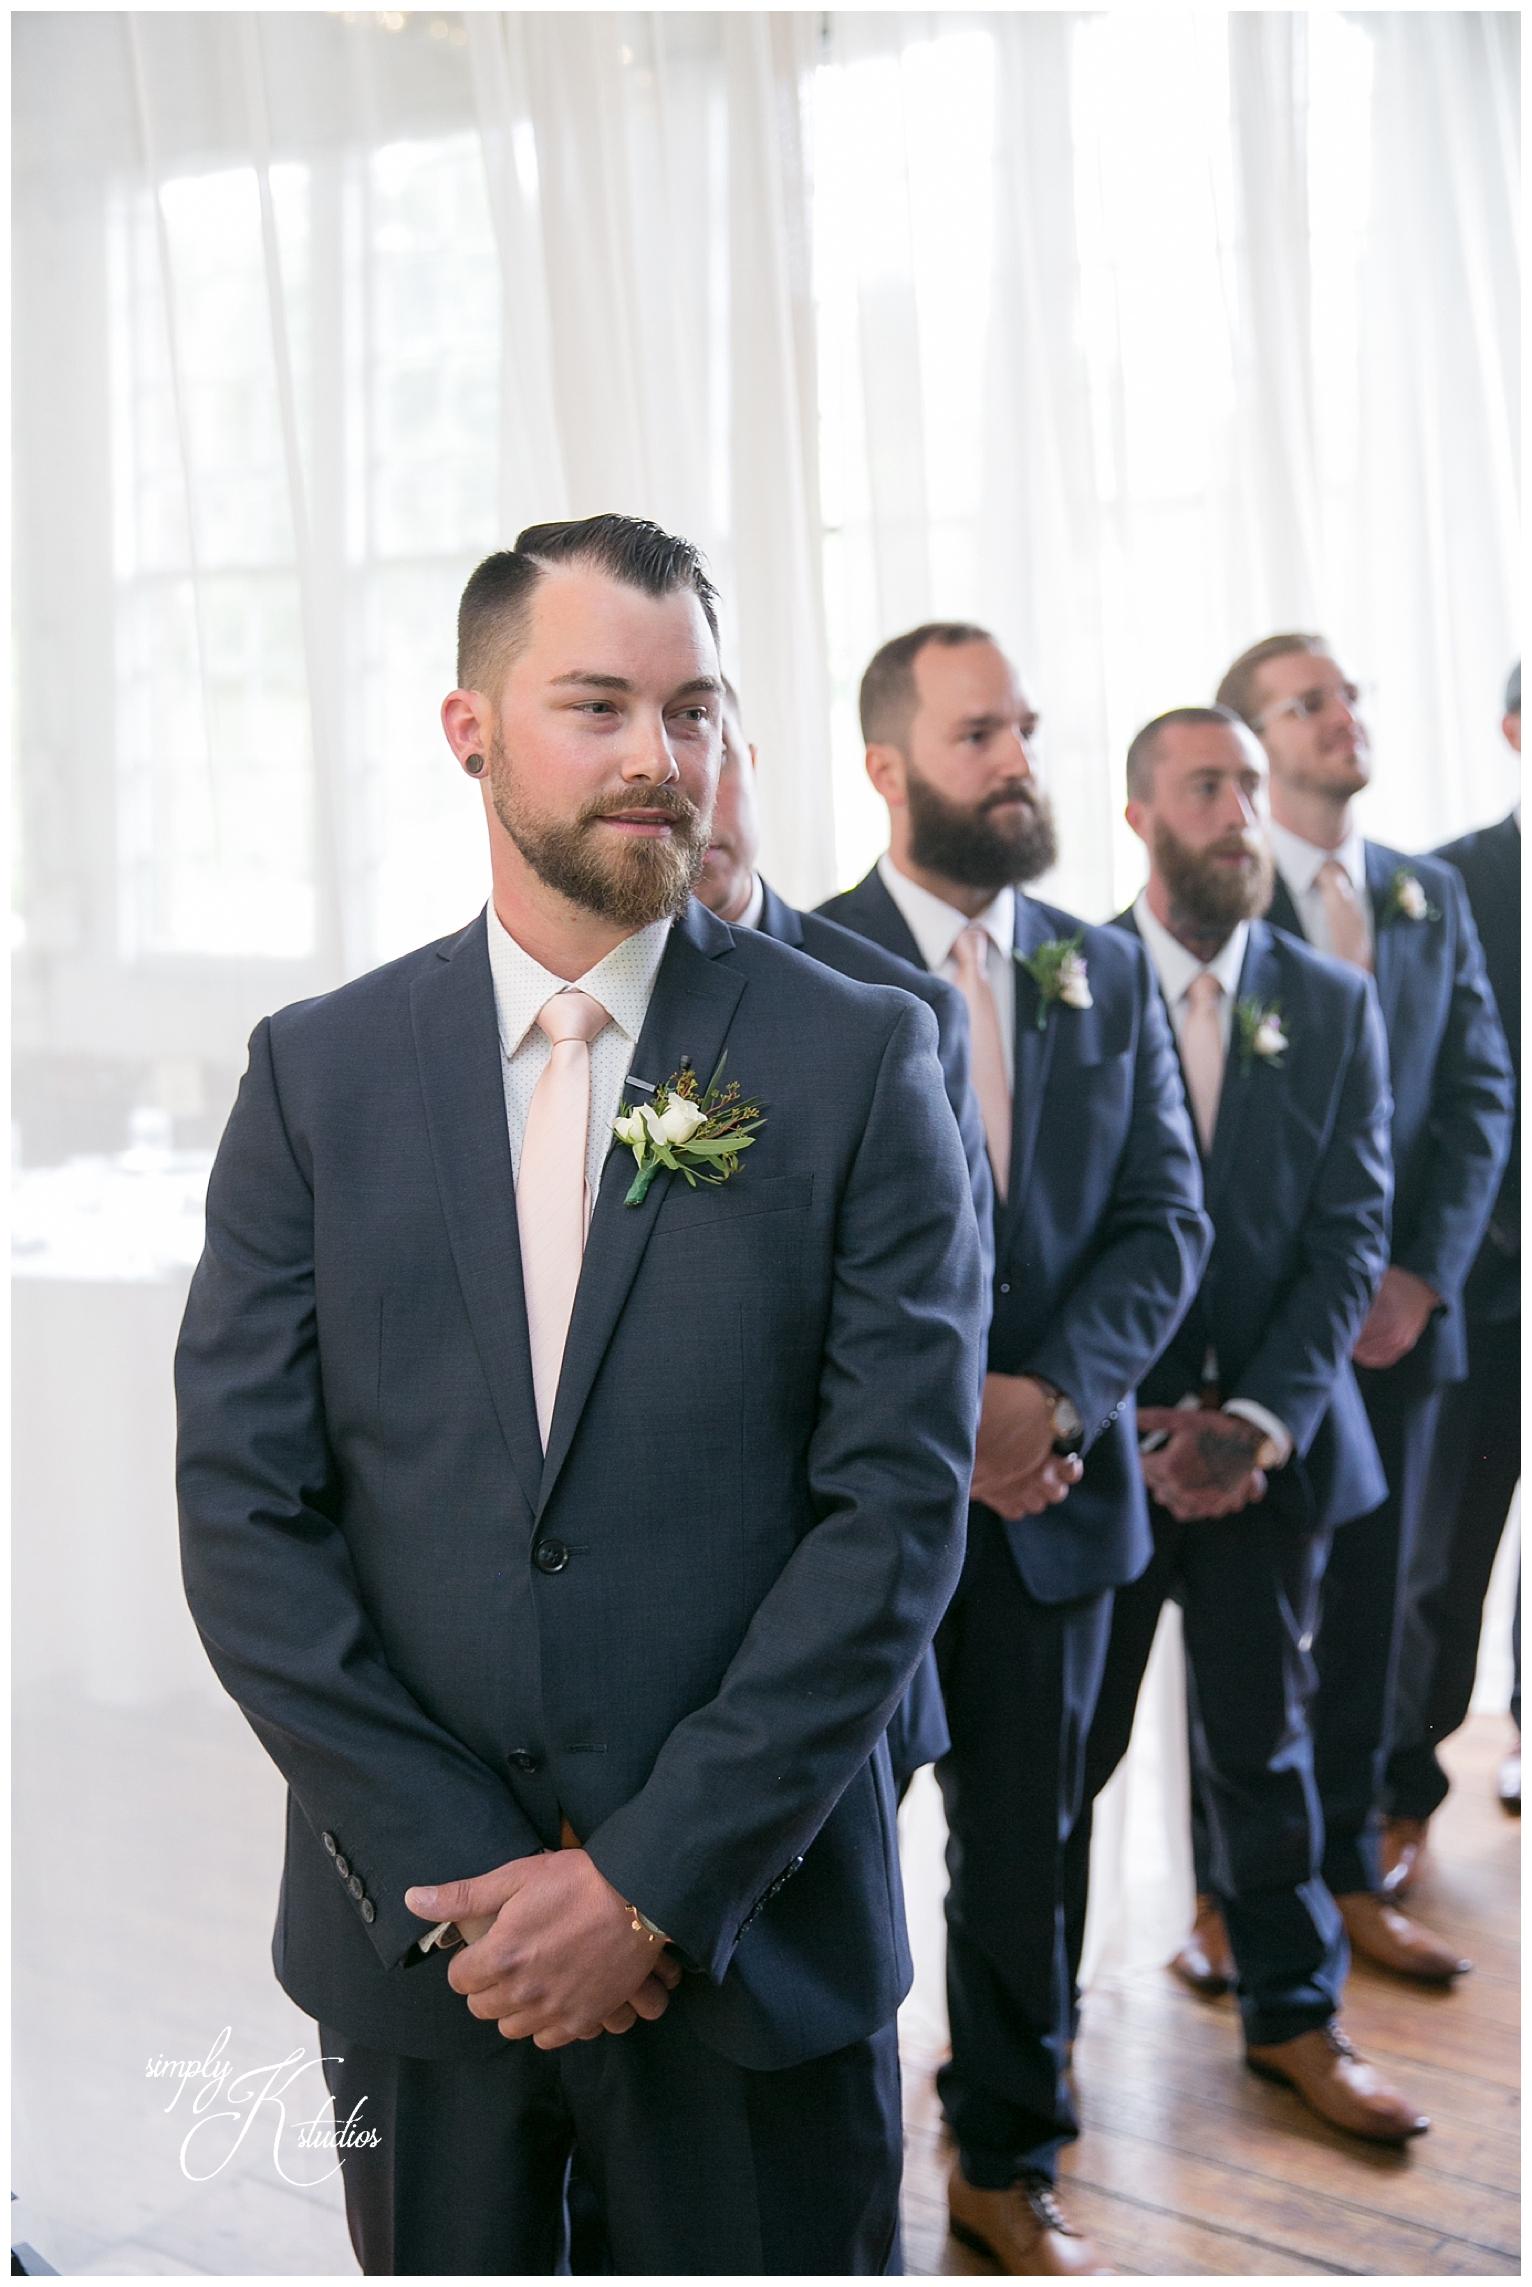 Groom at a Wedding.jpg